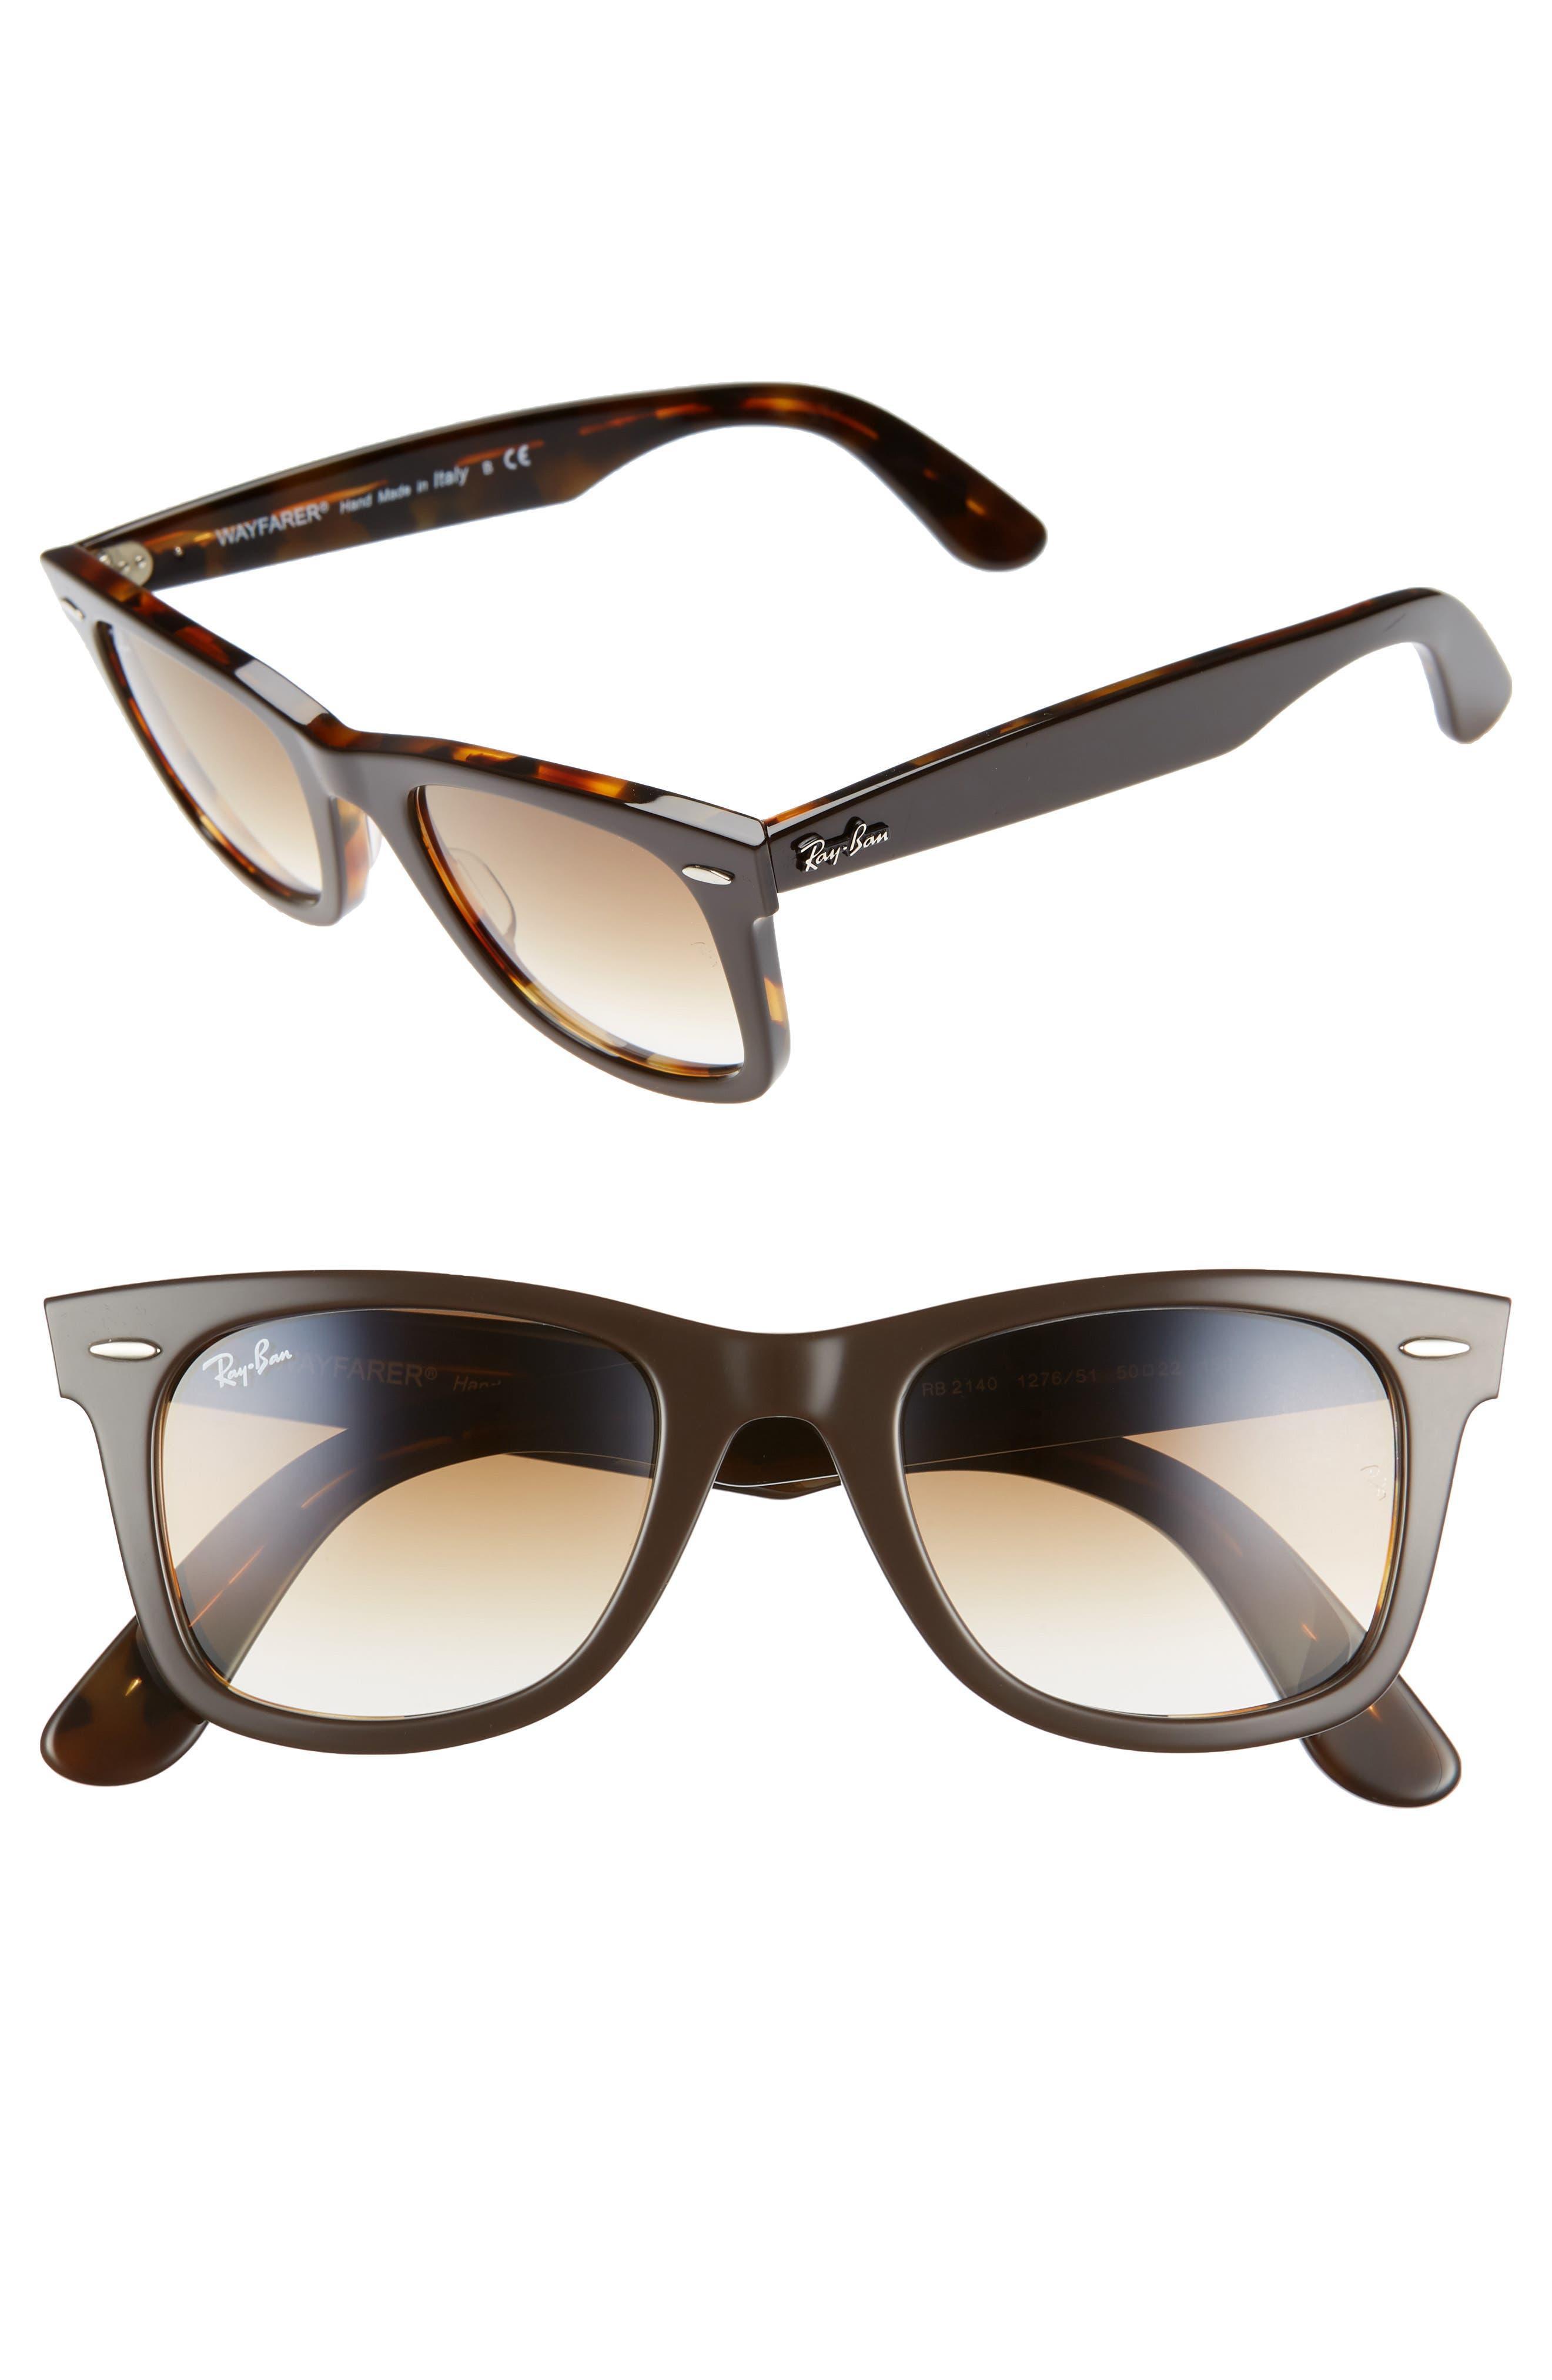 RAY-BAN 'Classic Wayfarer' 50mm Sunglasses, Main, color, BROWN/ YELLOW GRADIENT